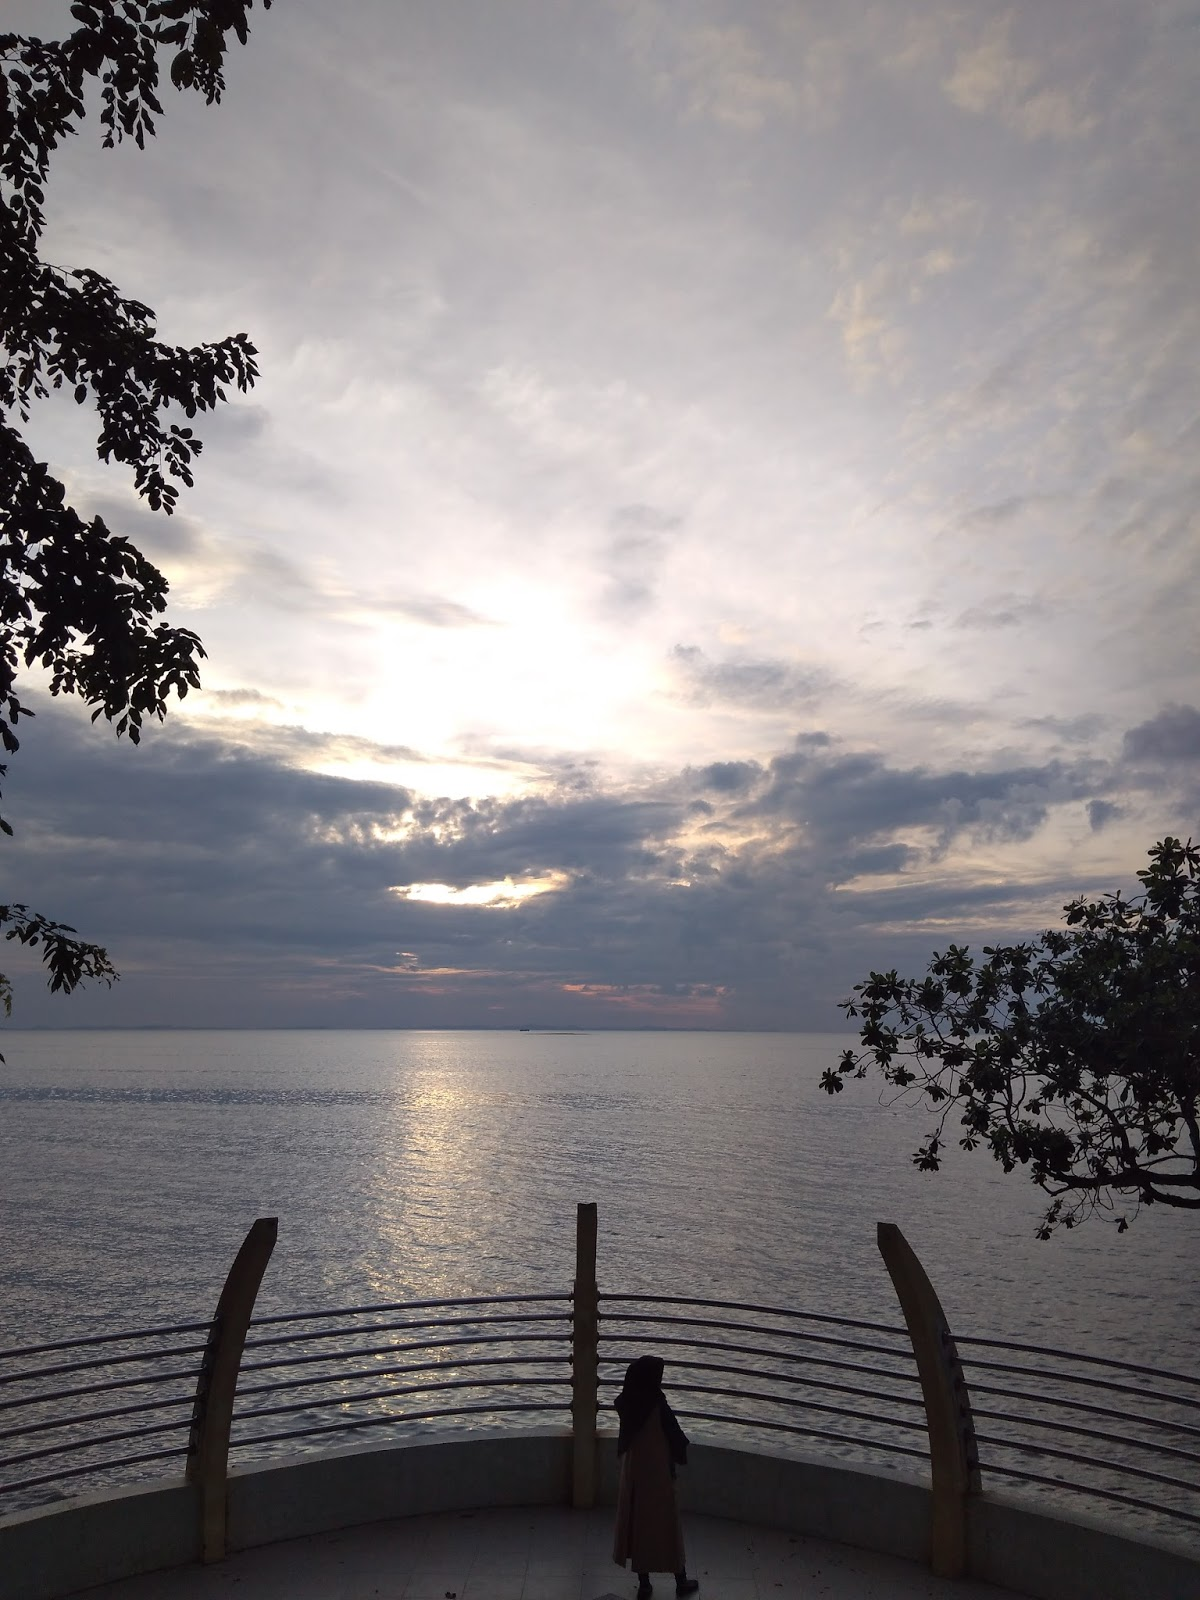 Qwerty Blog Tepi Laut Wisata Kota Tanjungpinang Foto Ambil Sekitar